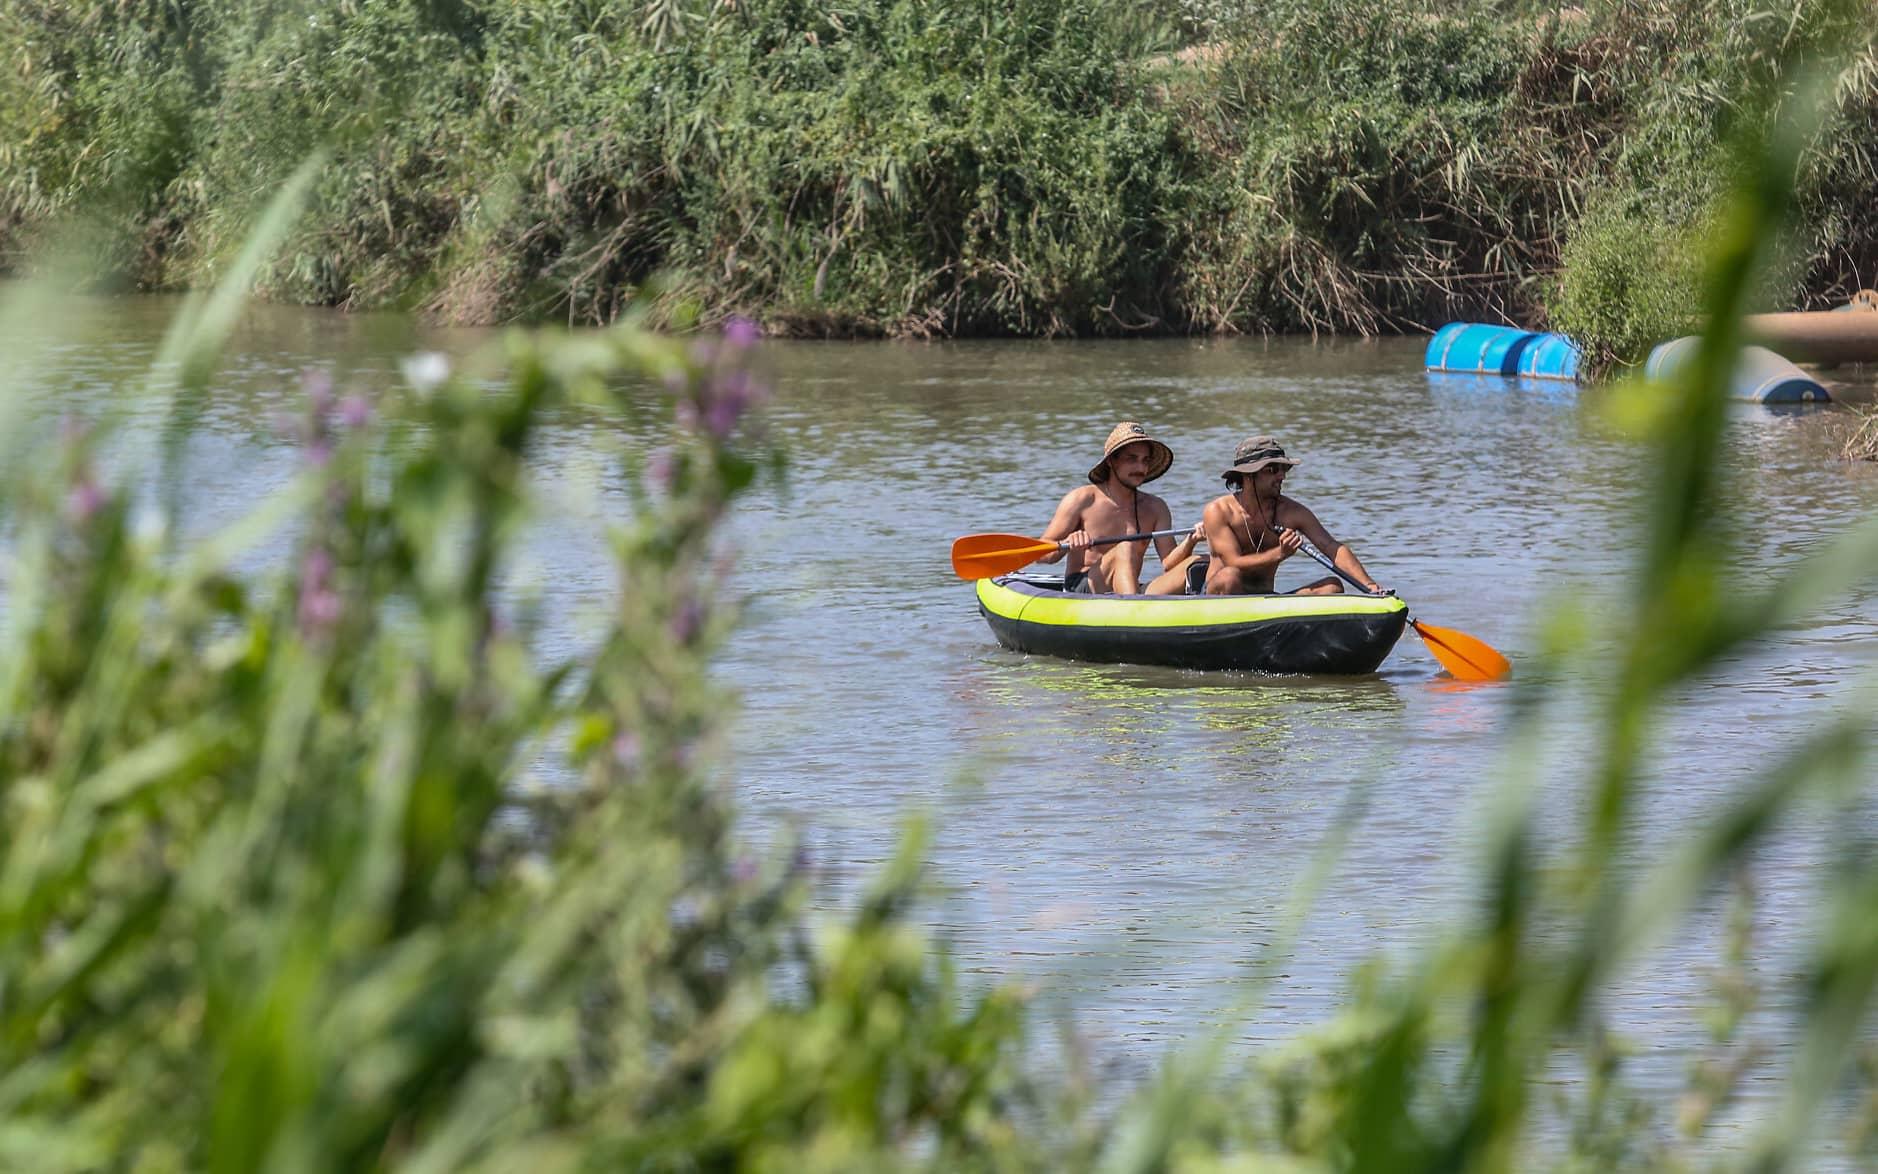 נהר הירדן. יולי 2020 (צילום: David Cohen/Flash90)